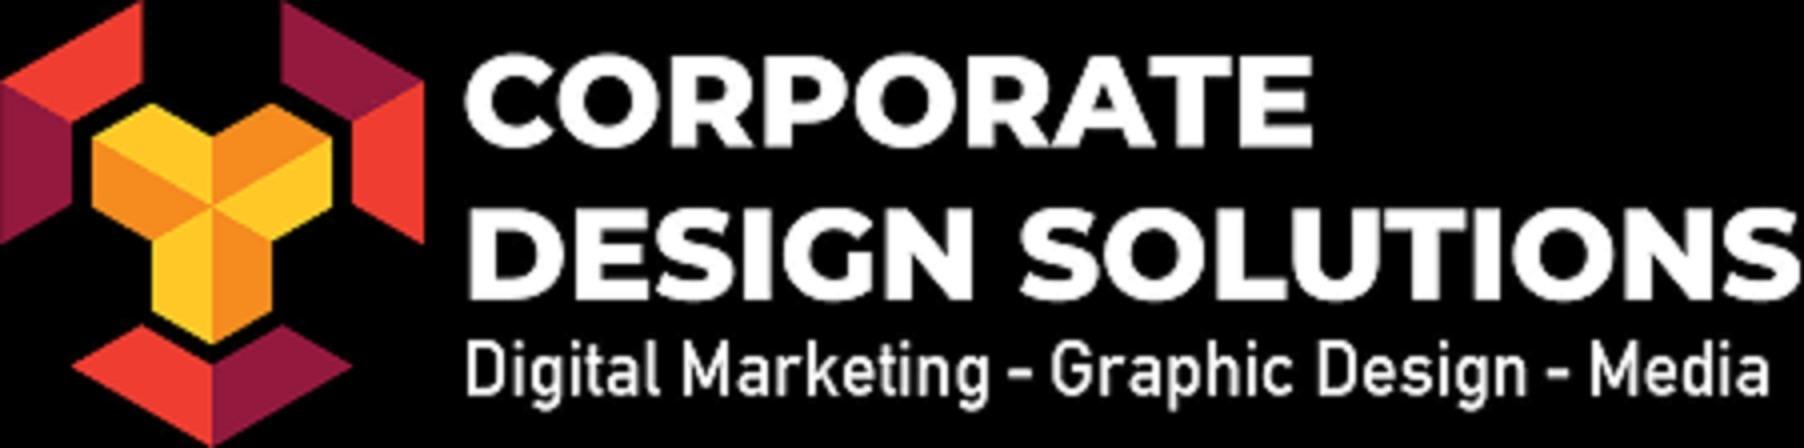 Philip Reece (@corporatedesign) Cover Image